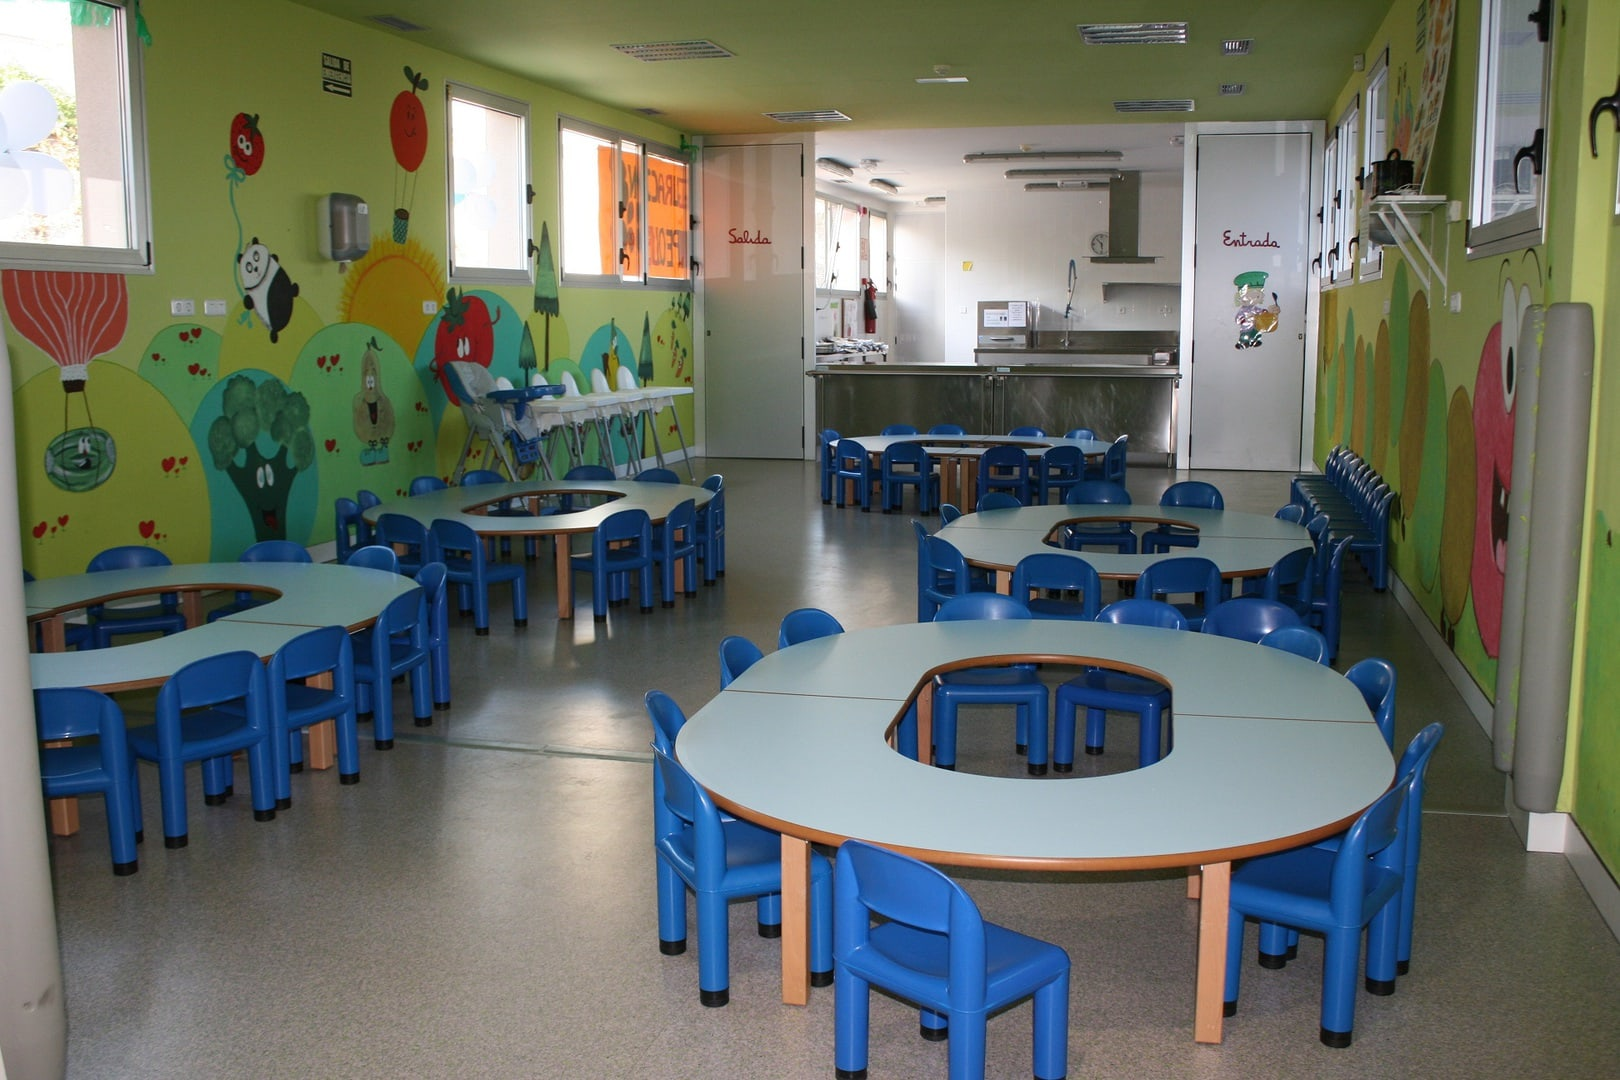 39 sanipeques 39 la escuela infantil municipal m s moderna de for Escuelas privadas de cocina